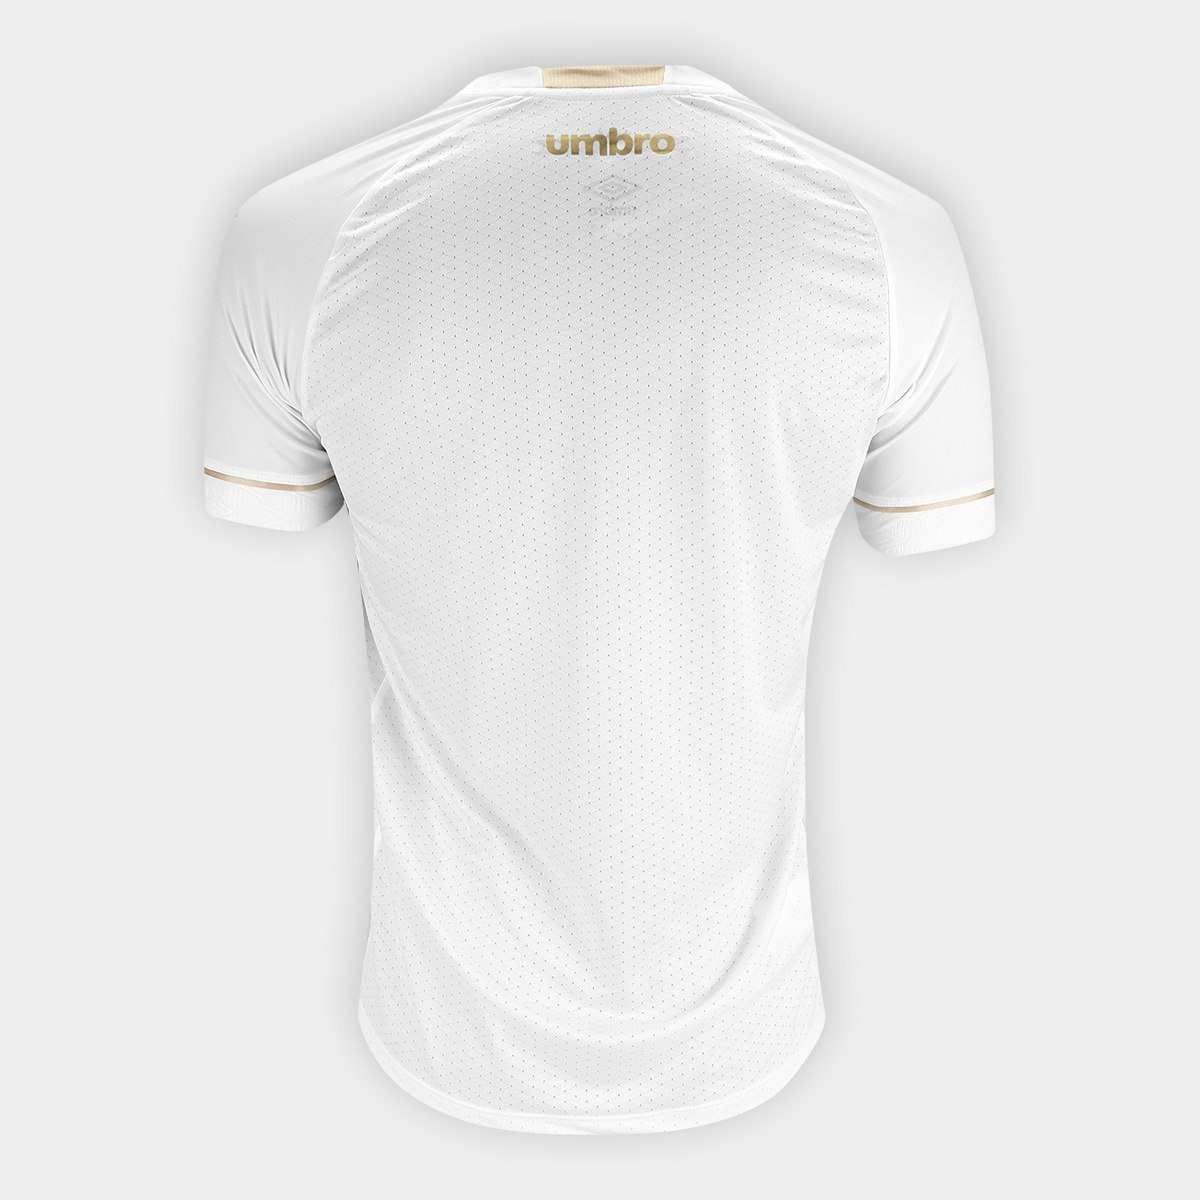 Camisa Umbro Masculina Santos I 2018 2019 Time Do Rei - R  142 8bfaa9360e4f2